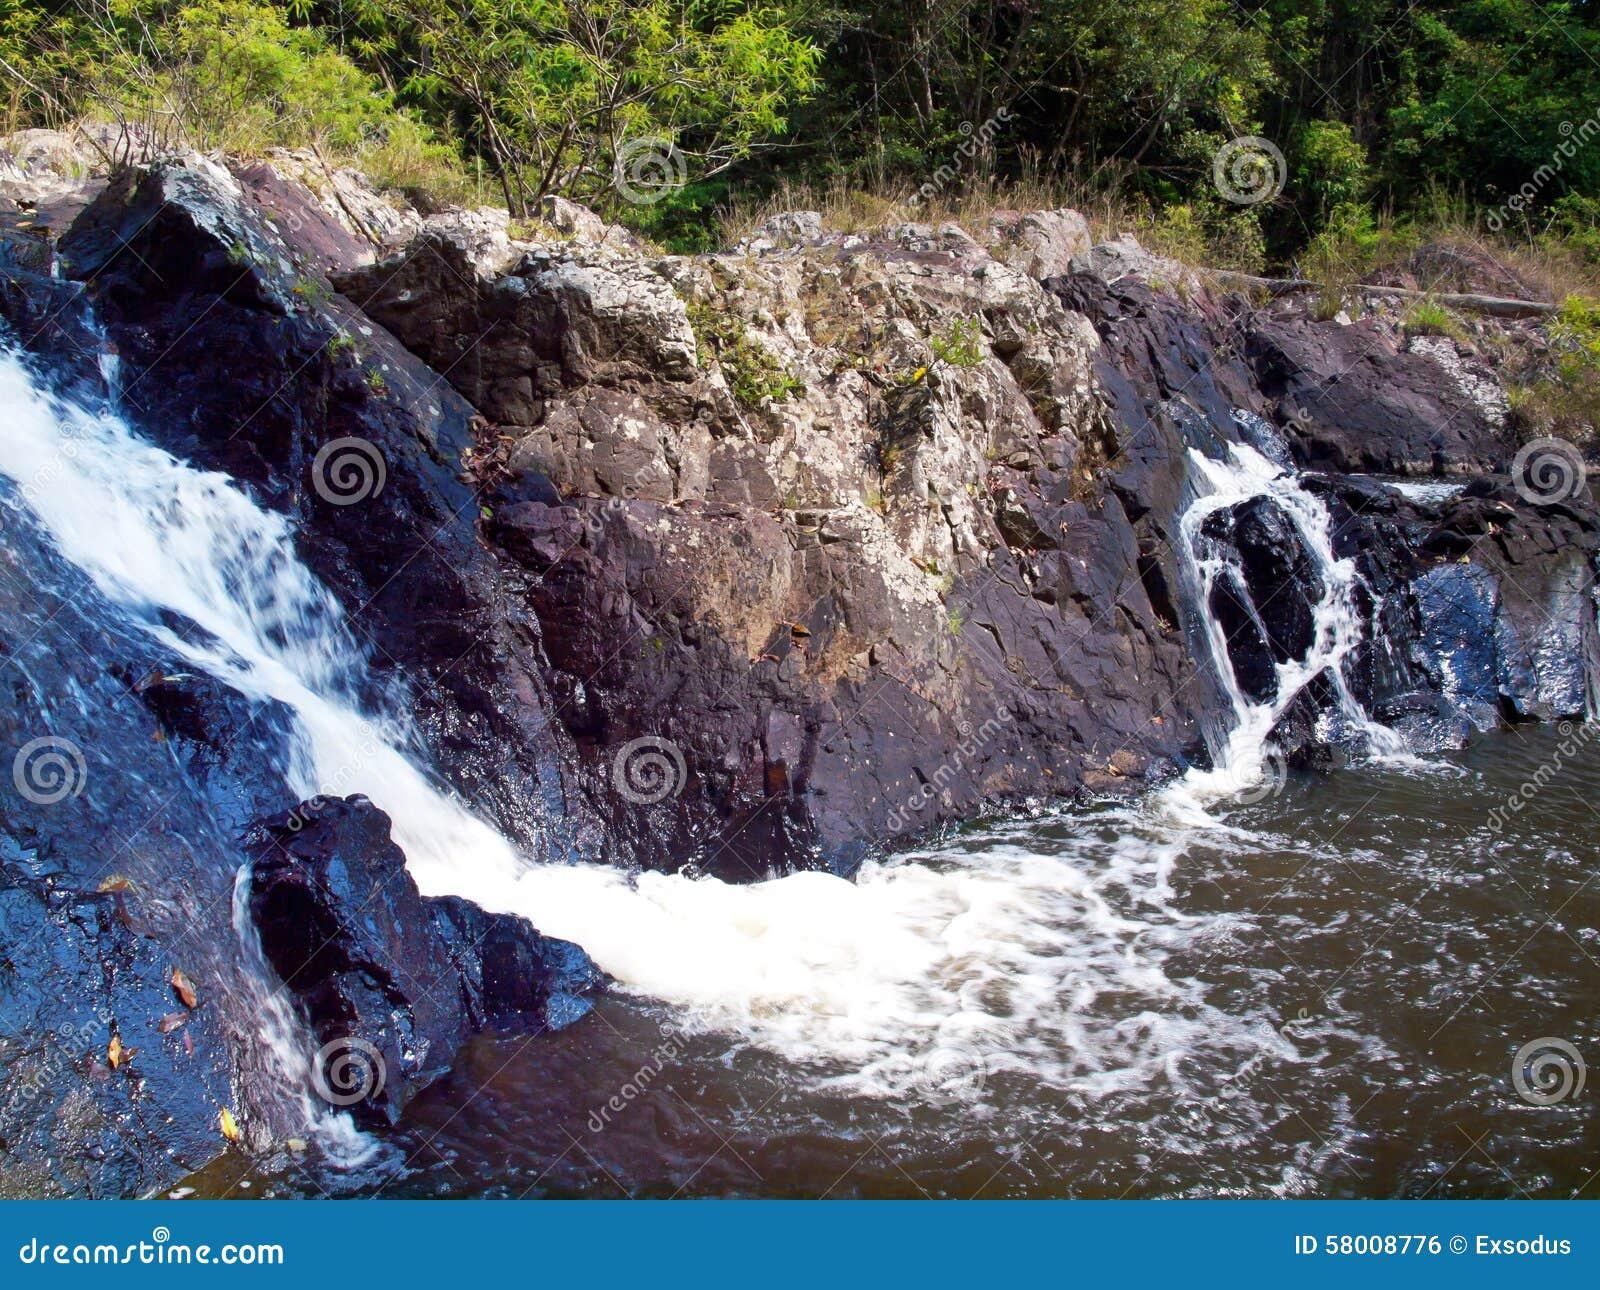 Nakhon Nayok Thailand  city pictures gallery : Kong Kaew Waterfall, Khao Yai National Park, Nakhon Nayok, Thailand ...